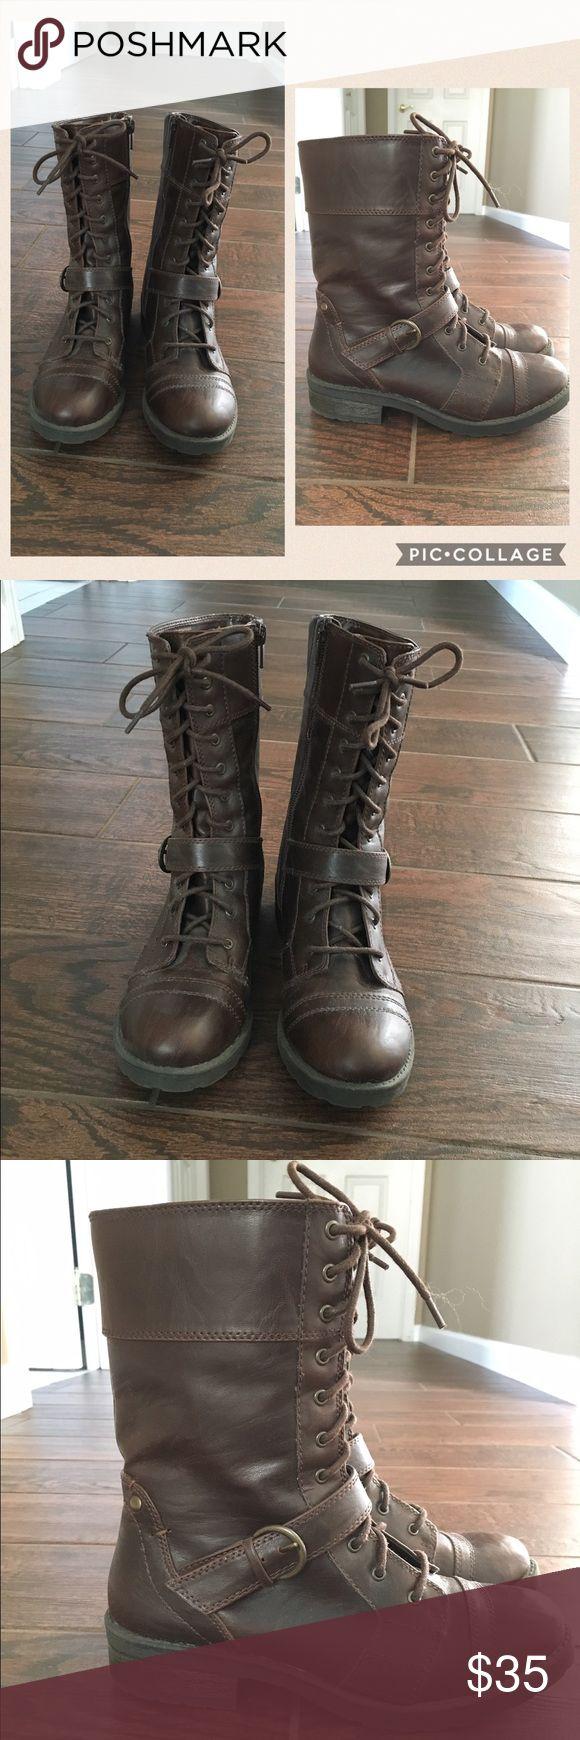 Women's combat boots. Dark brown combat boots. White Mountain Shoes Combat & Moto Boots